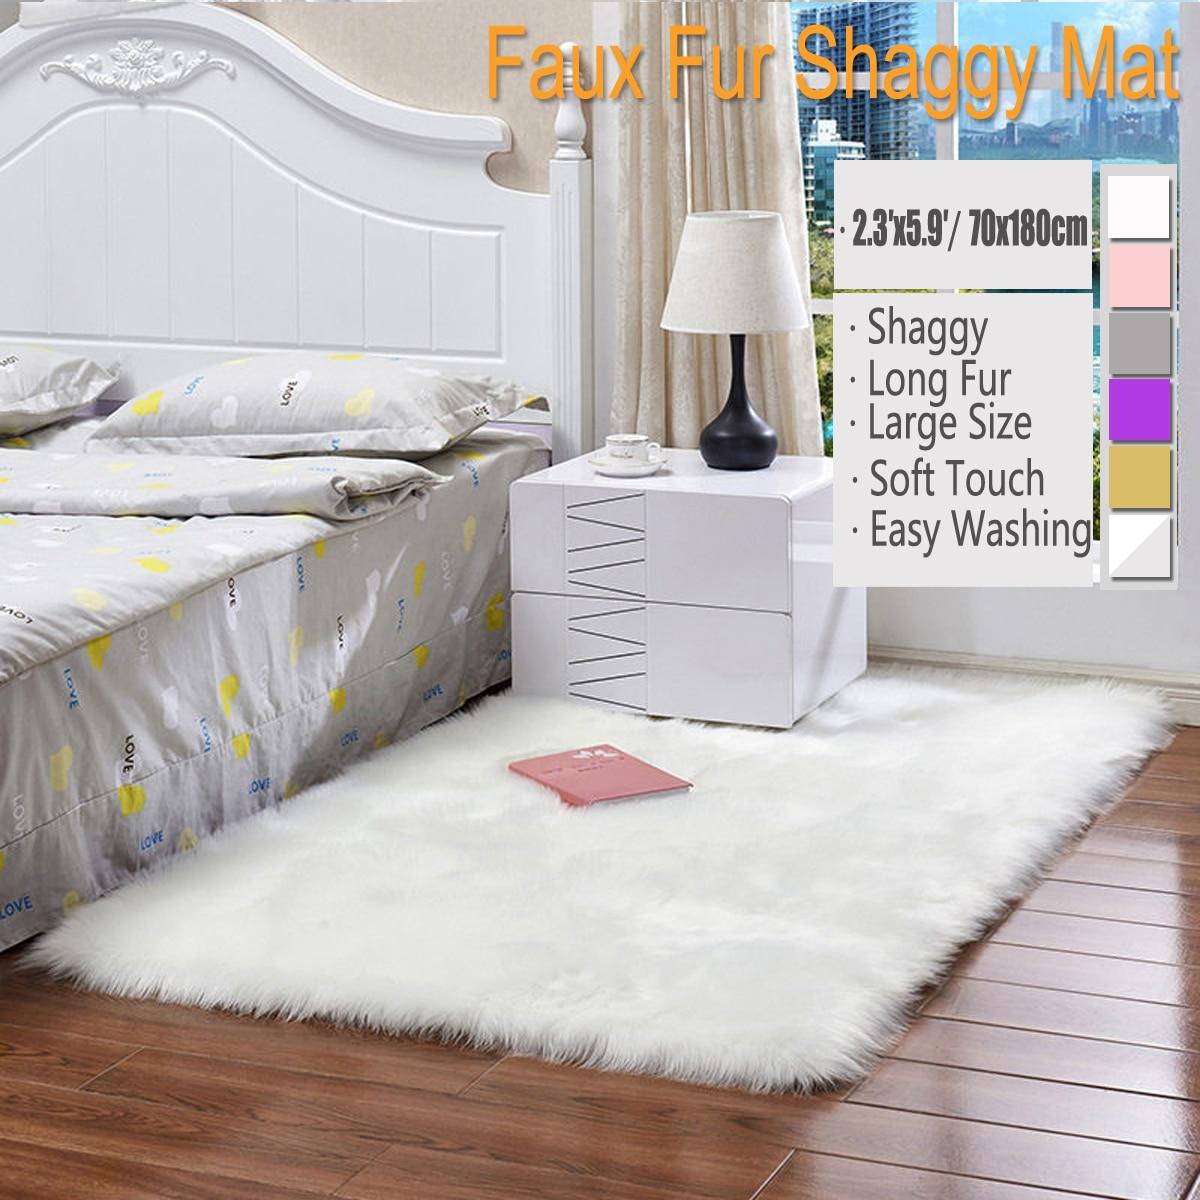 Us 30 71 52 Off 70 180cm Wool Imitation Sheepskin Rugs Faux Fur Non Slip Bedroom Shaggy Carpet Living Room Mats Round Rug Bedroom Faux Mat In Carpet